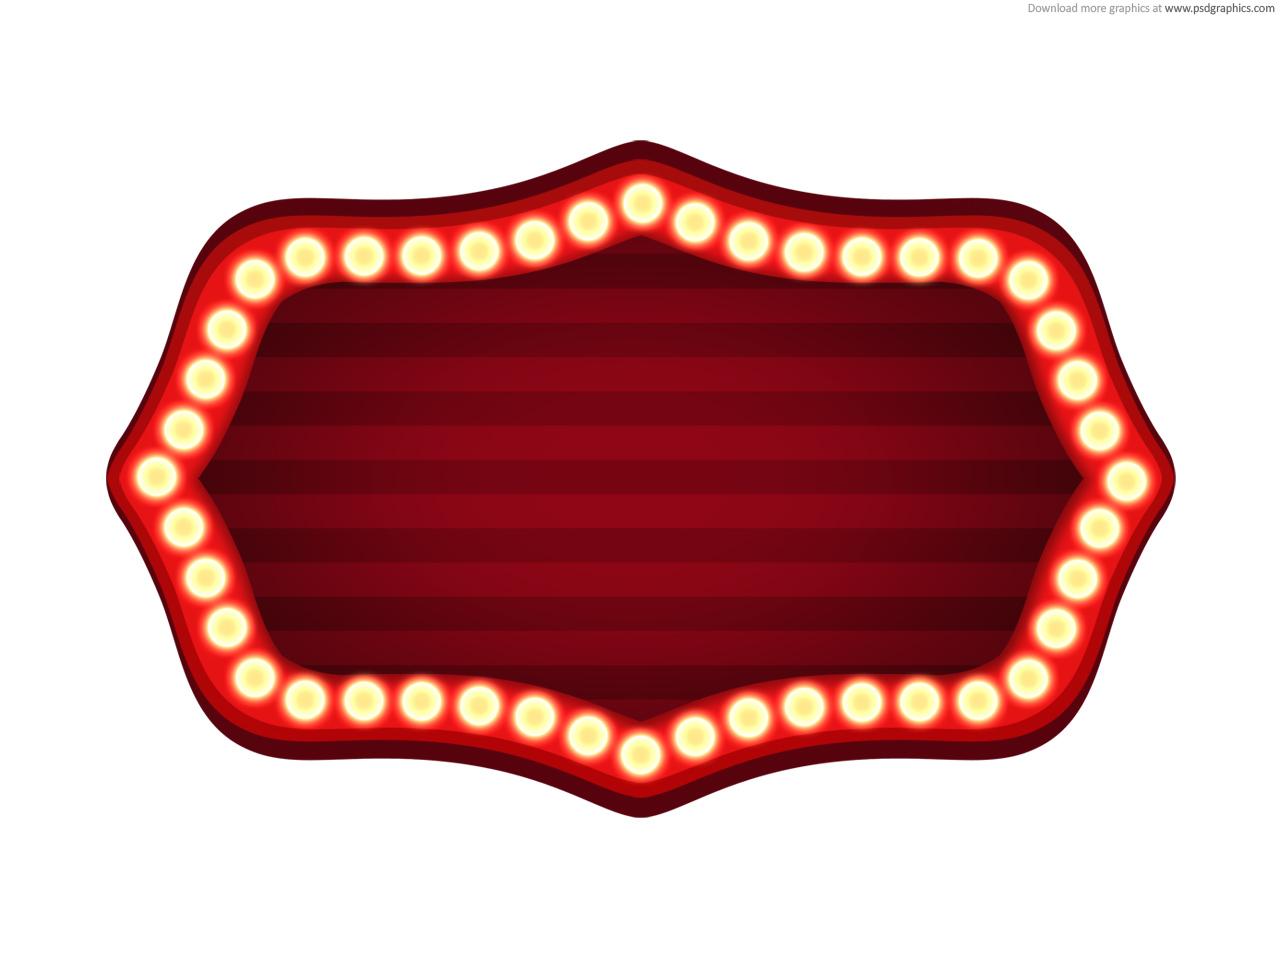 1280x960 Movie Popcorn Clipart